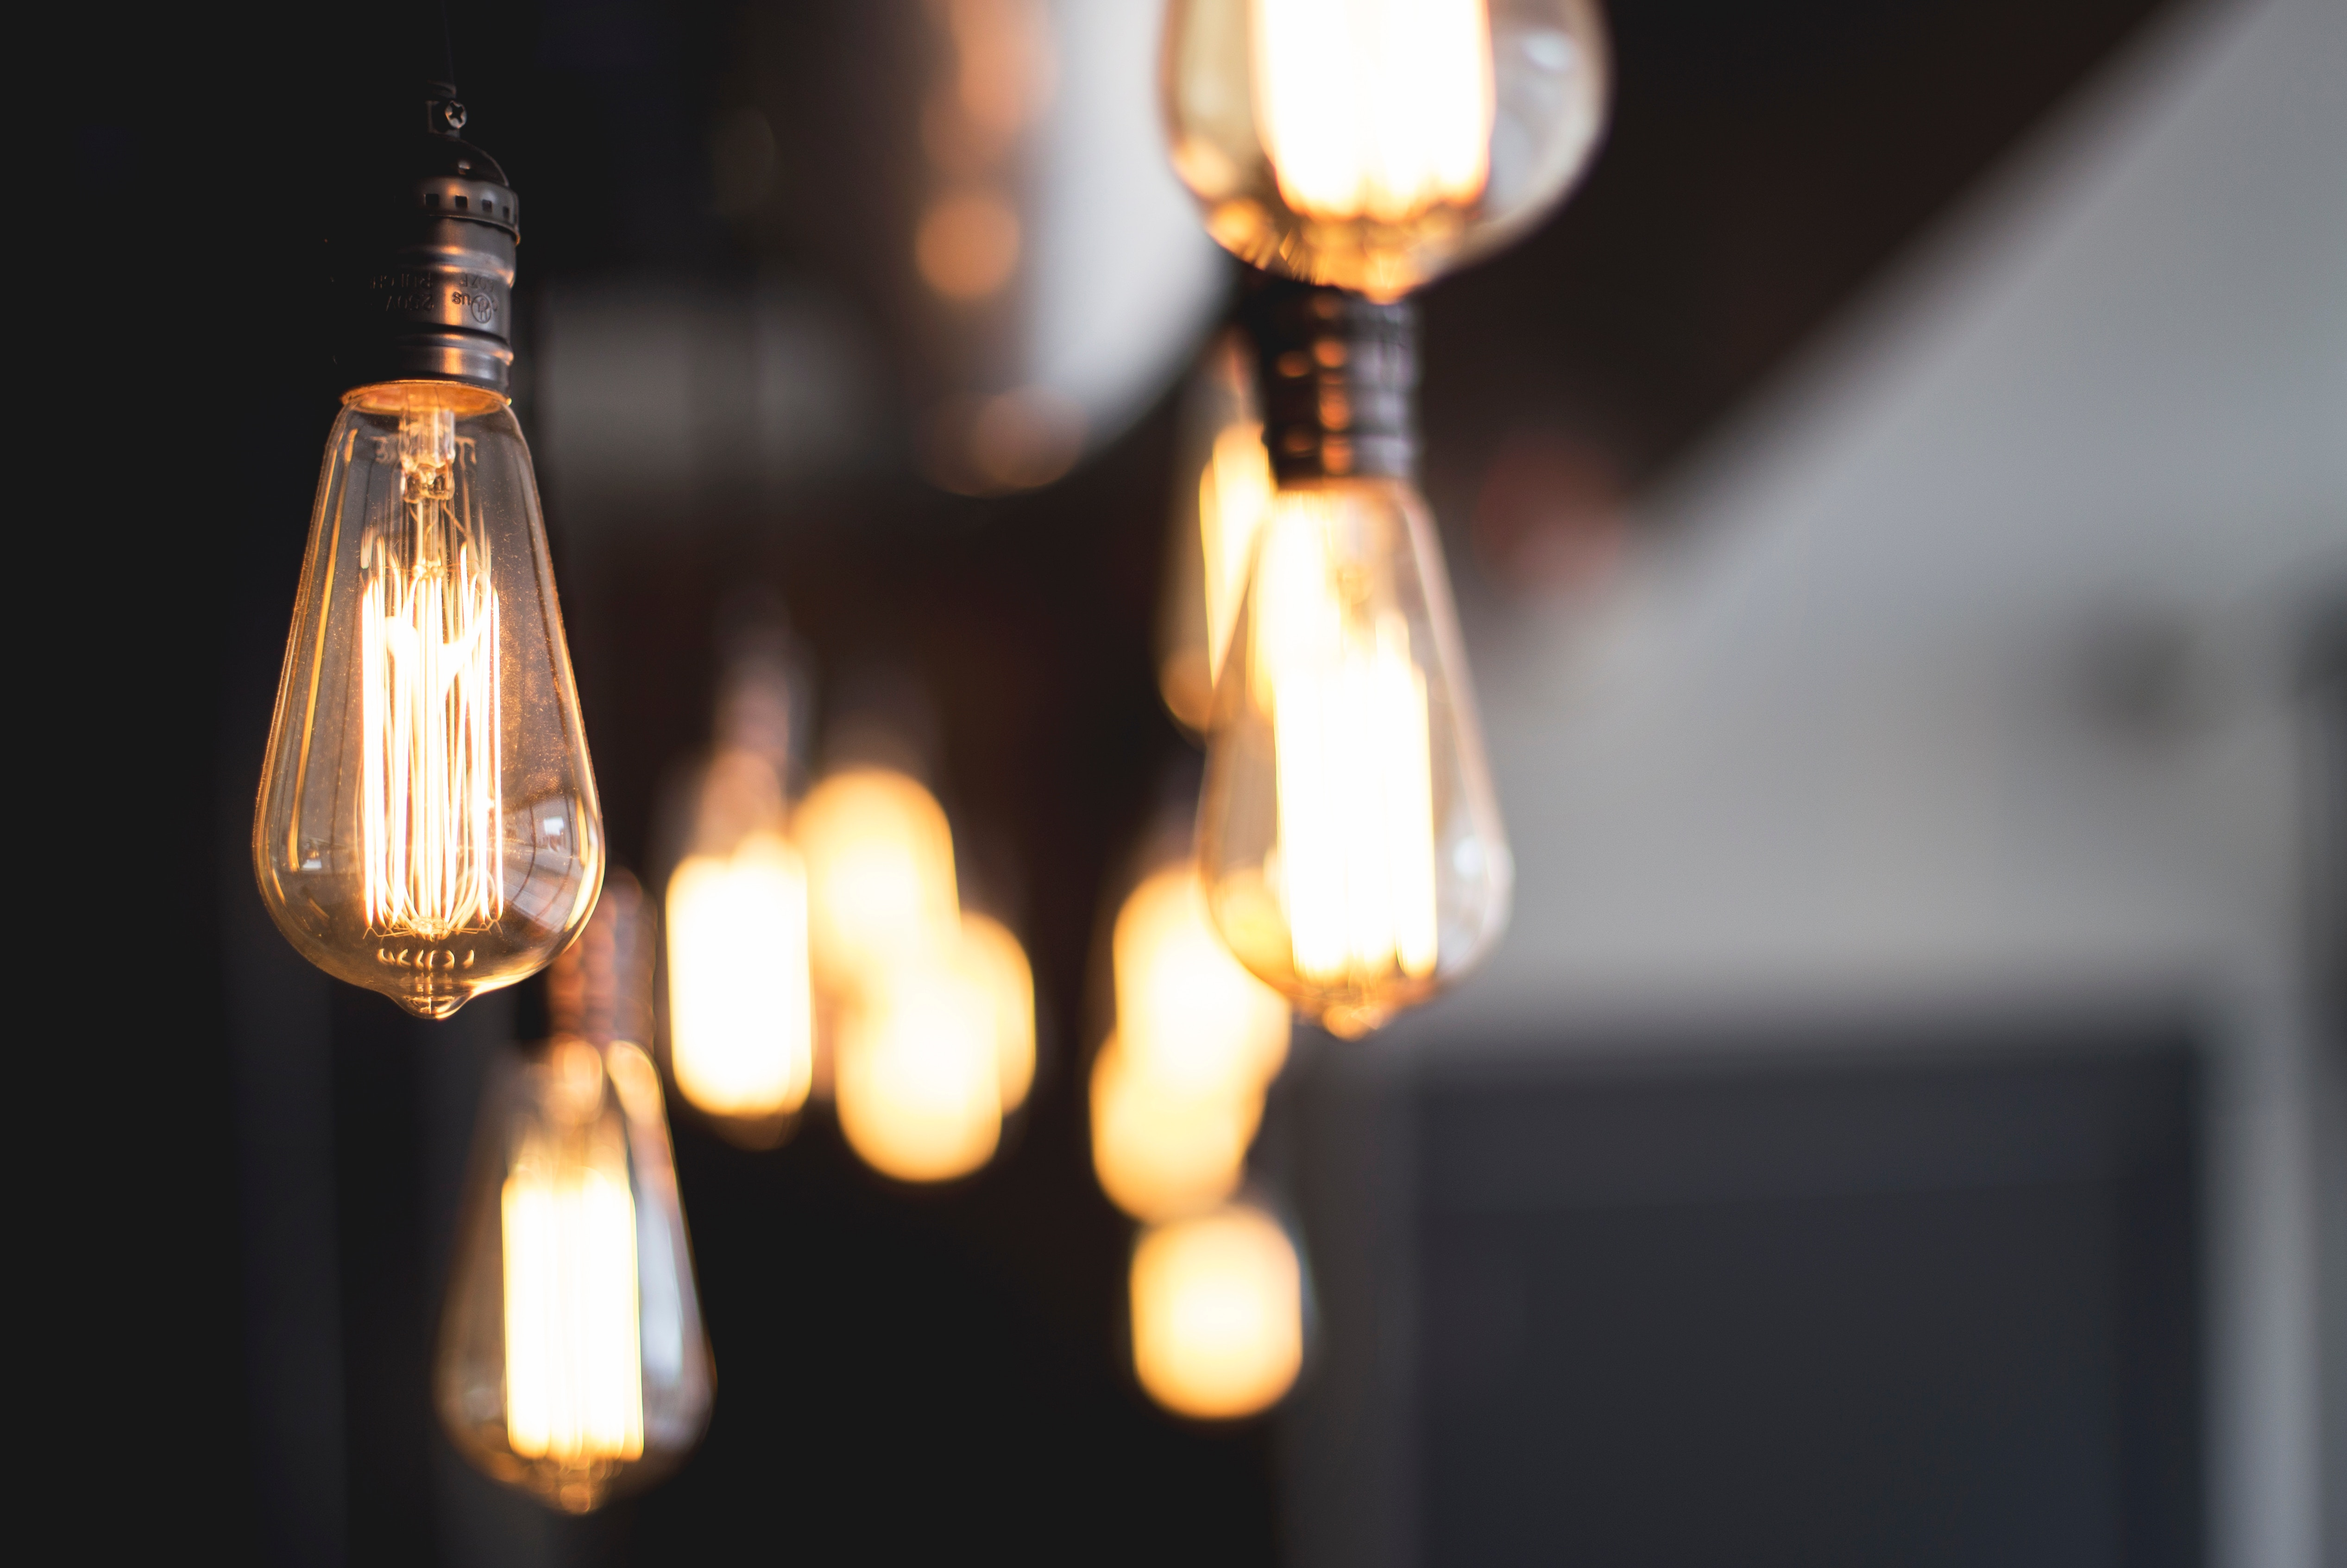 Incandescent light bulbs create an artistic tableau